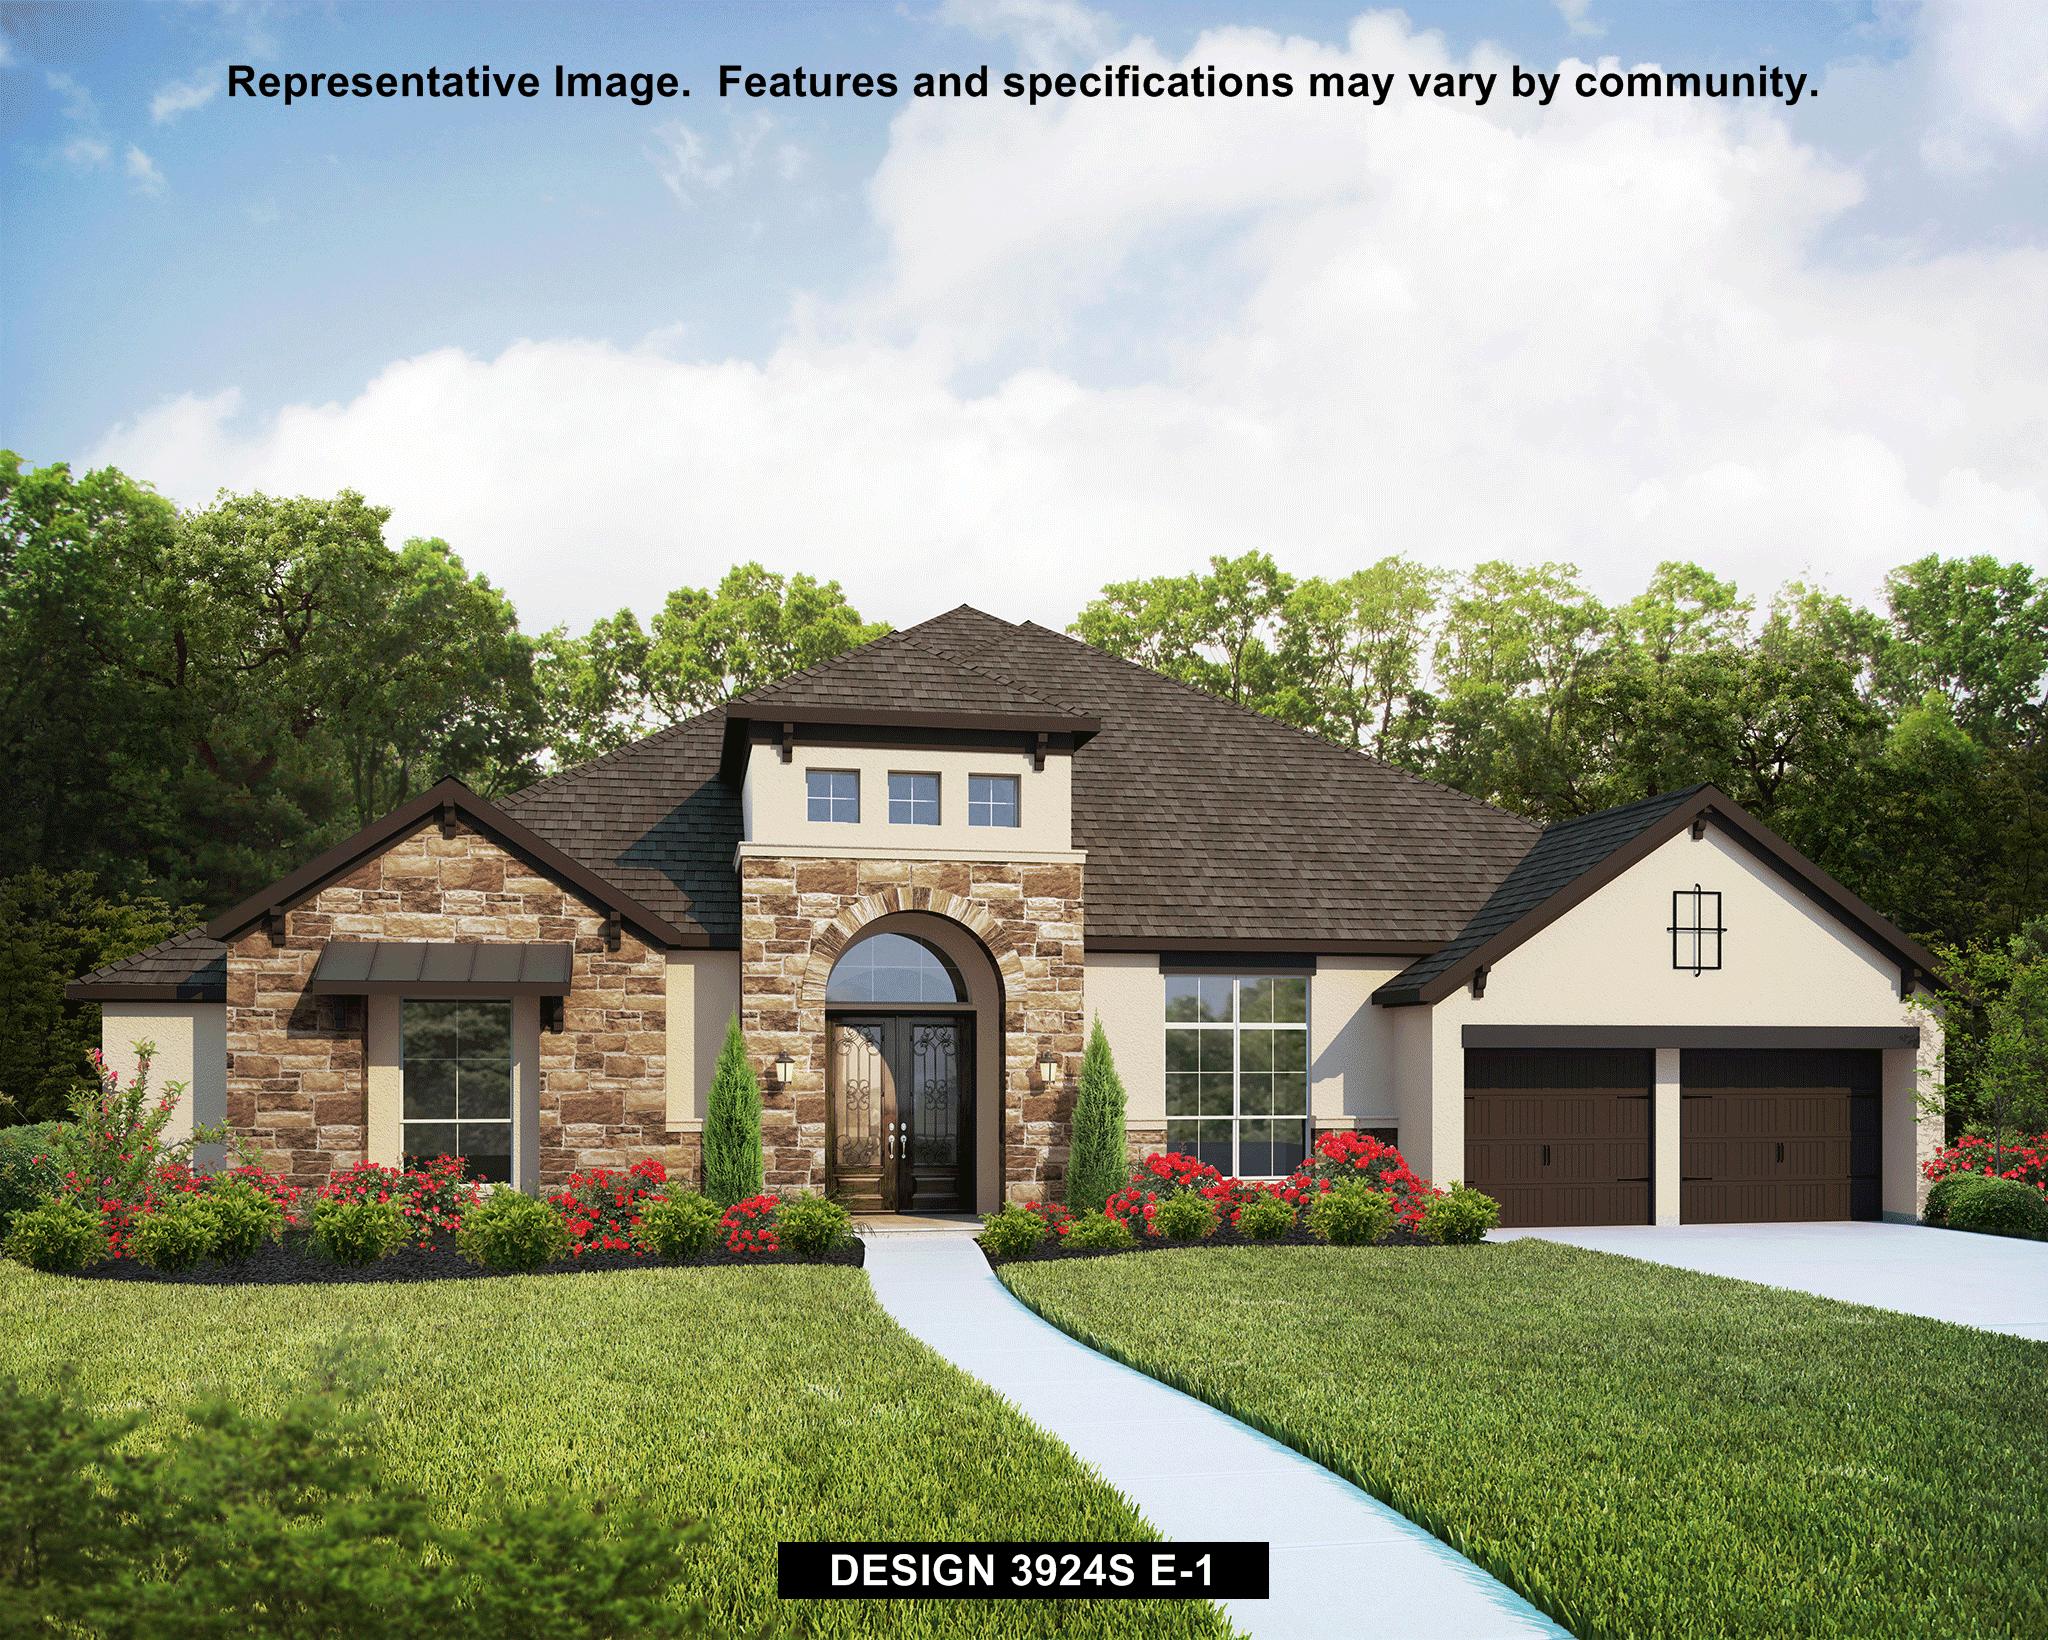 Single Family for Sale at Balcones Creek Half Acre - 3924s 7986 Cibolo View Fair Oaks Ranch, Texas 78015 United States